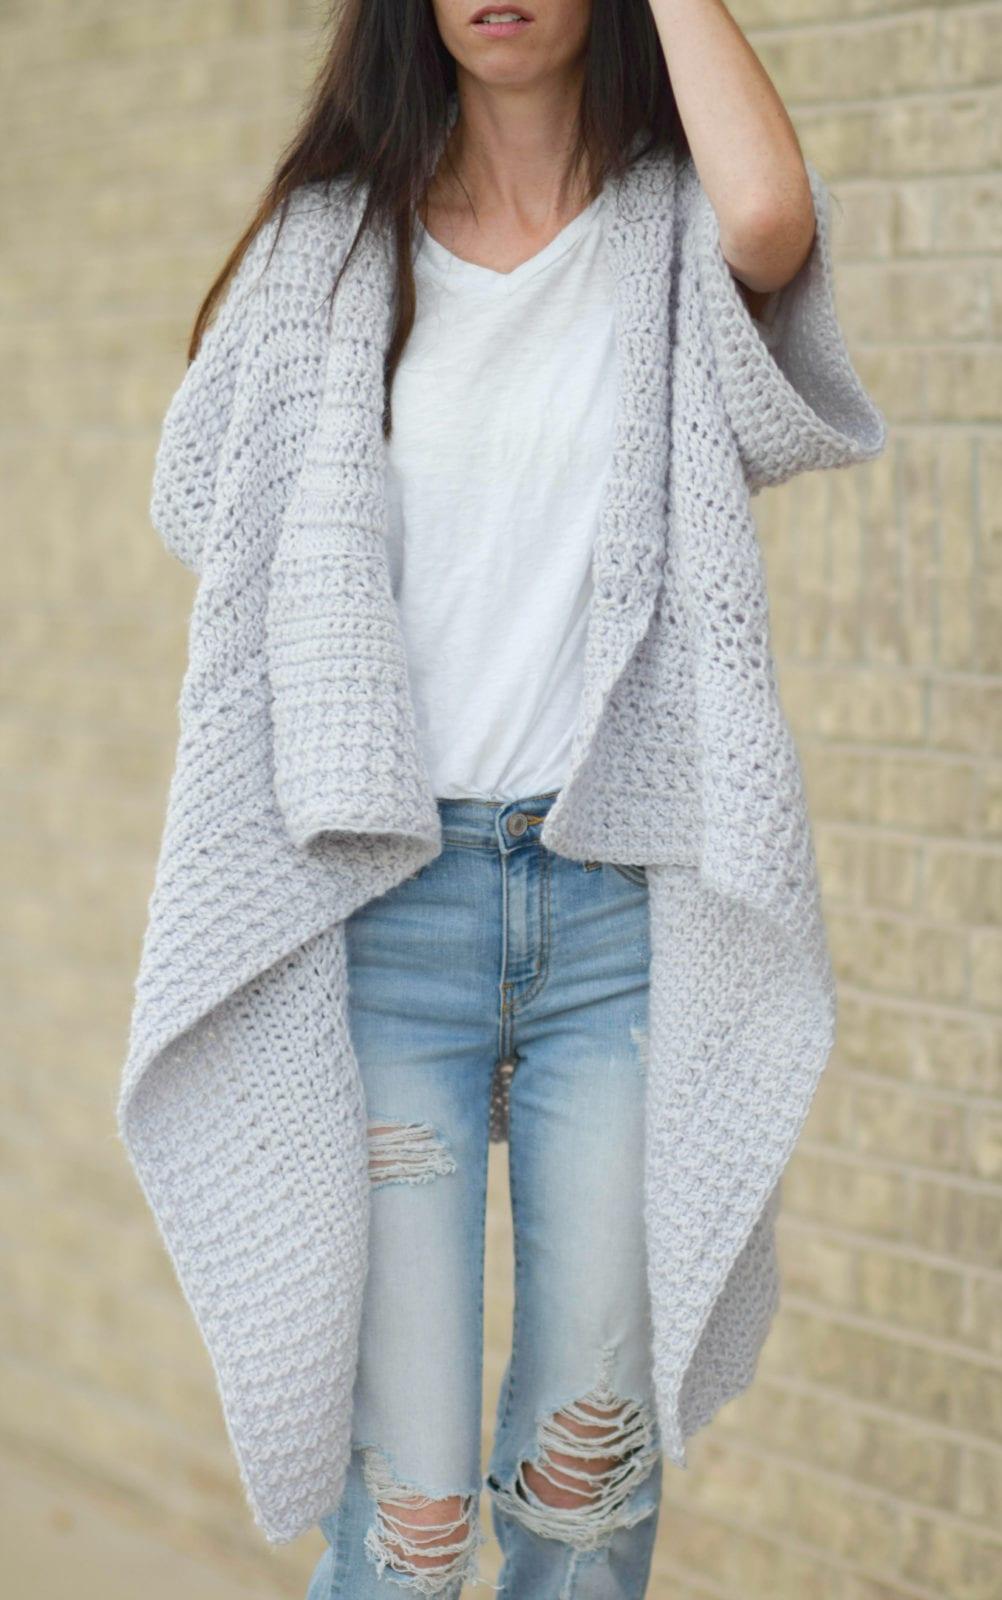 My Favorite Blogger Crochet Patterns From 2017 - Sewrella